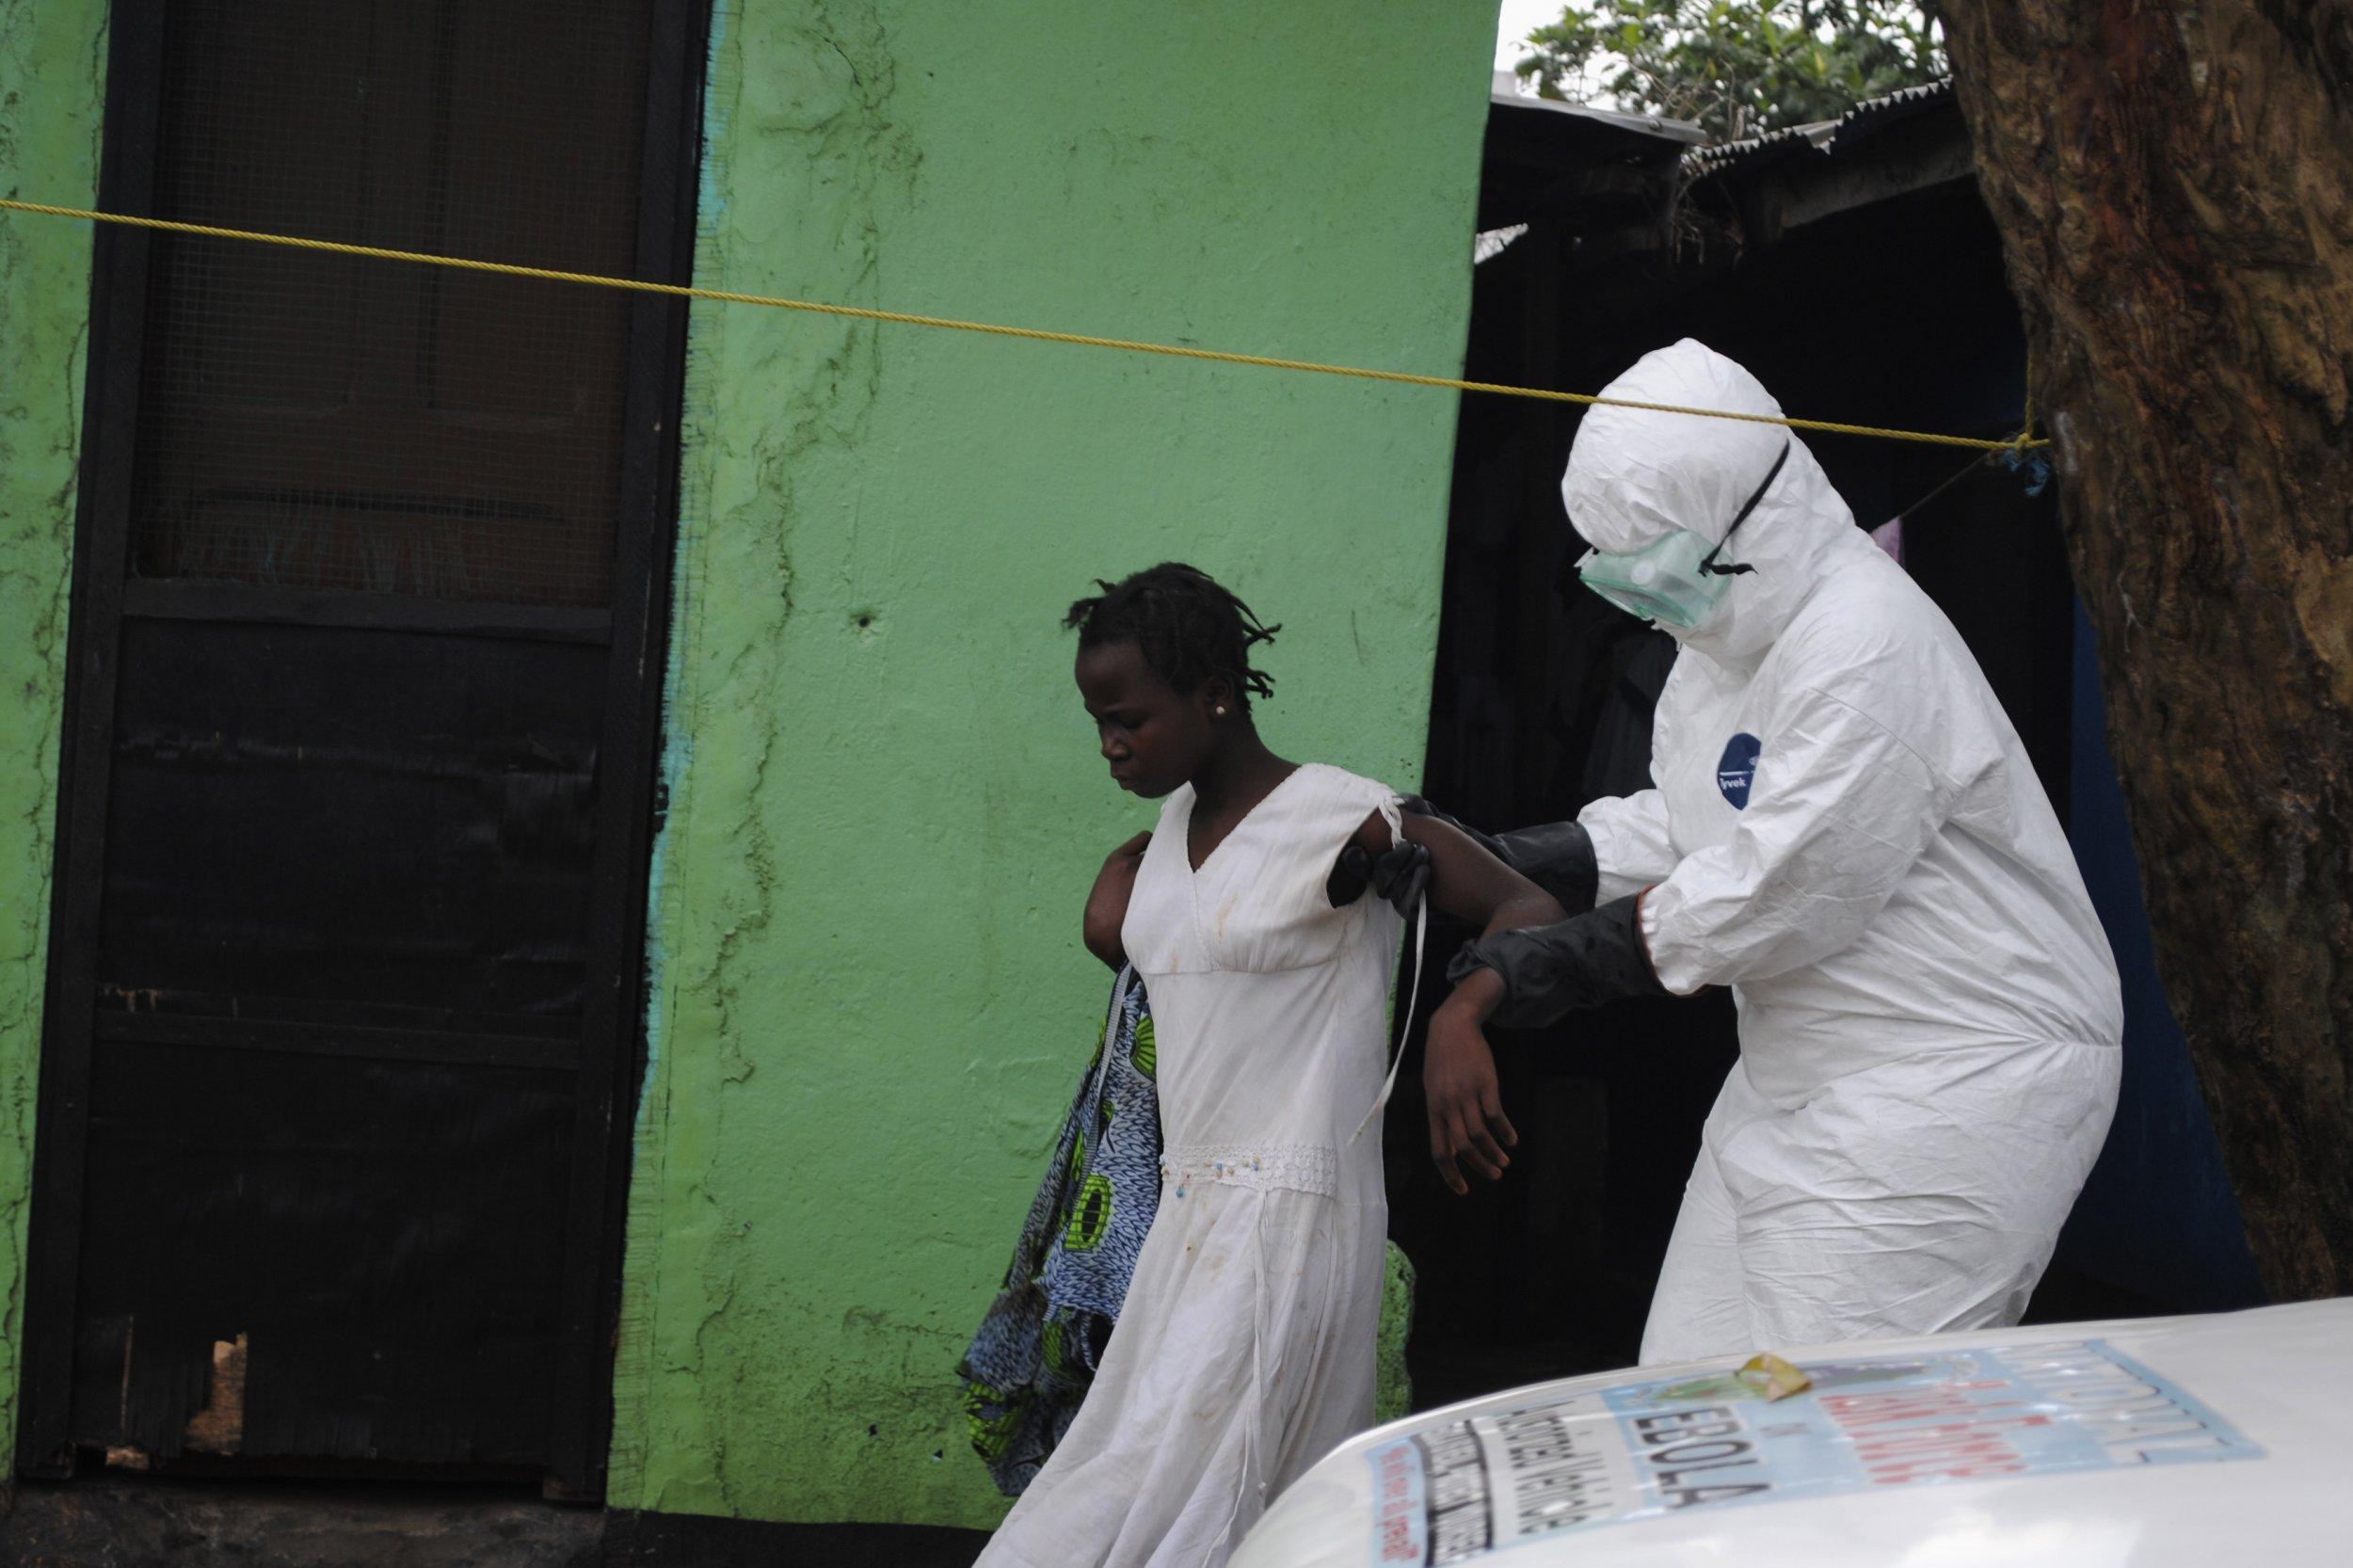 Ebola Patient September 15, 2014